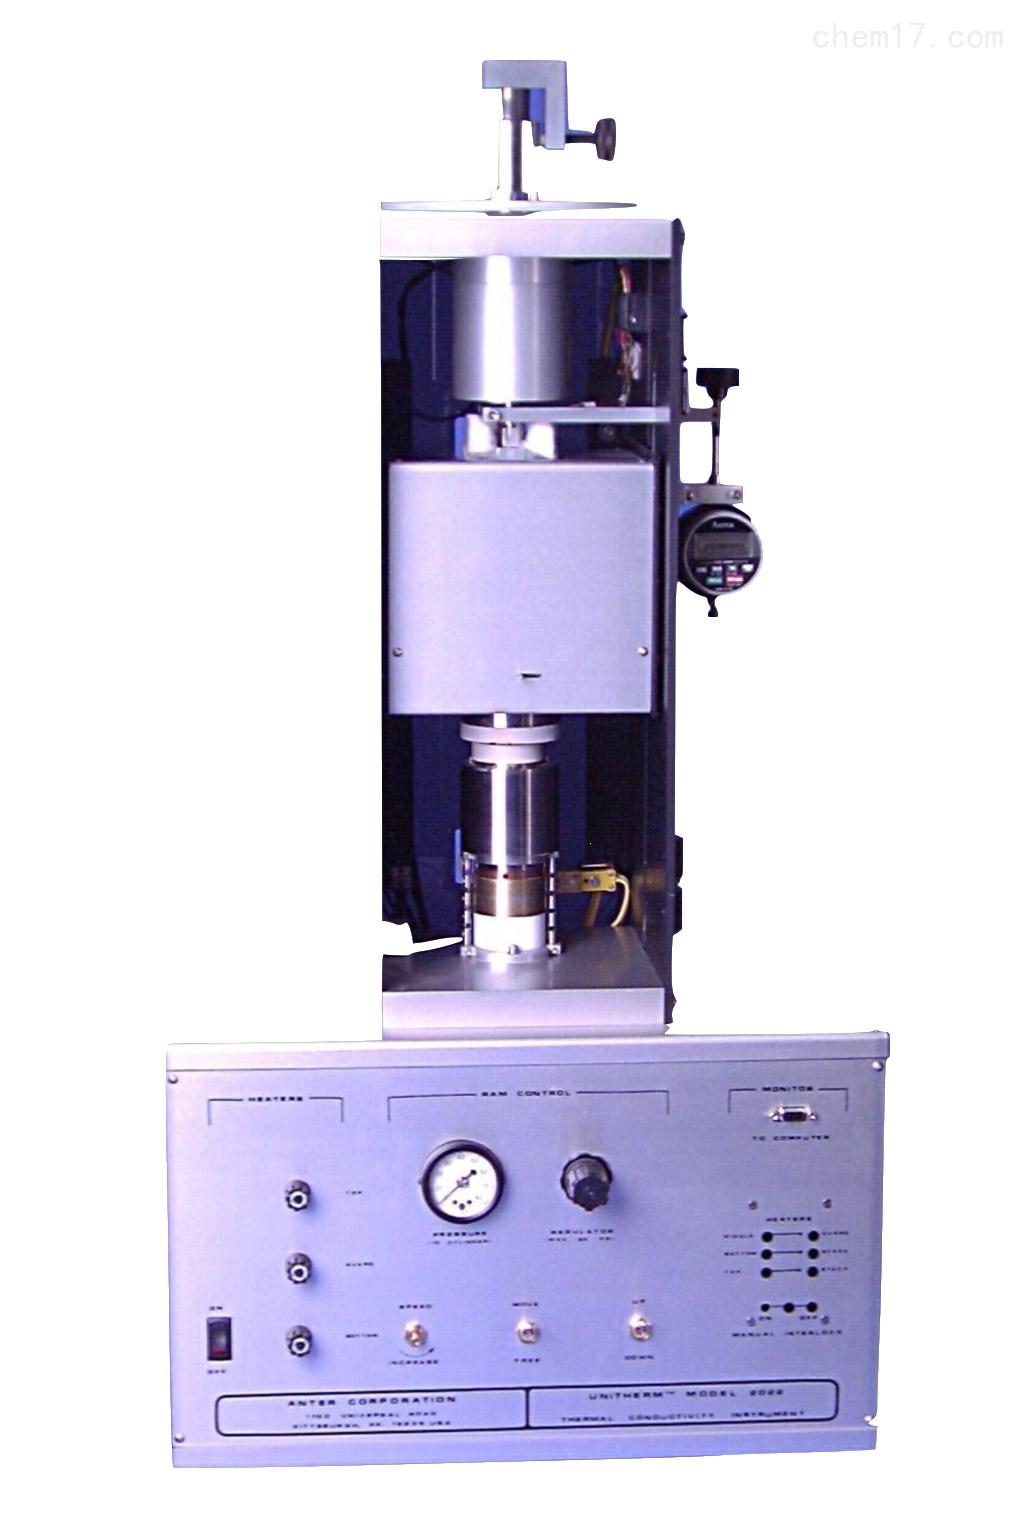 JH-I-6系列导热系数测试仪(热流法)